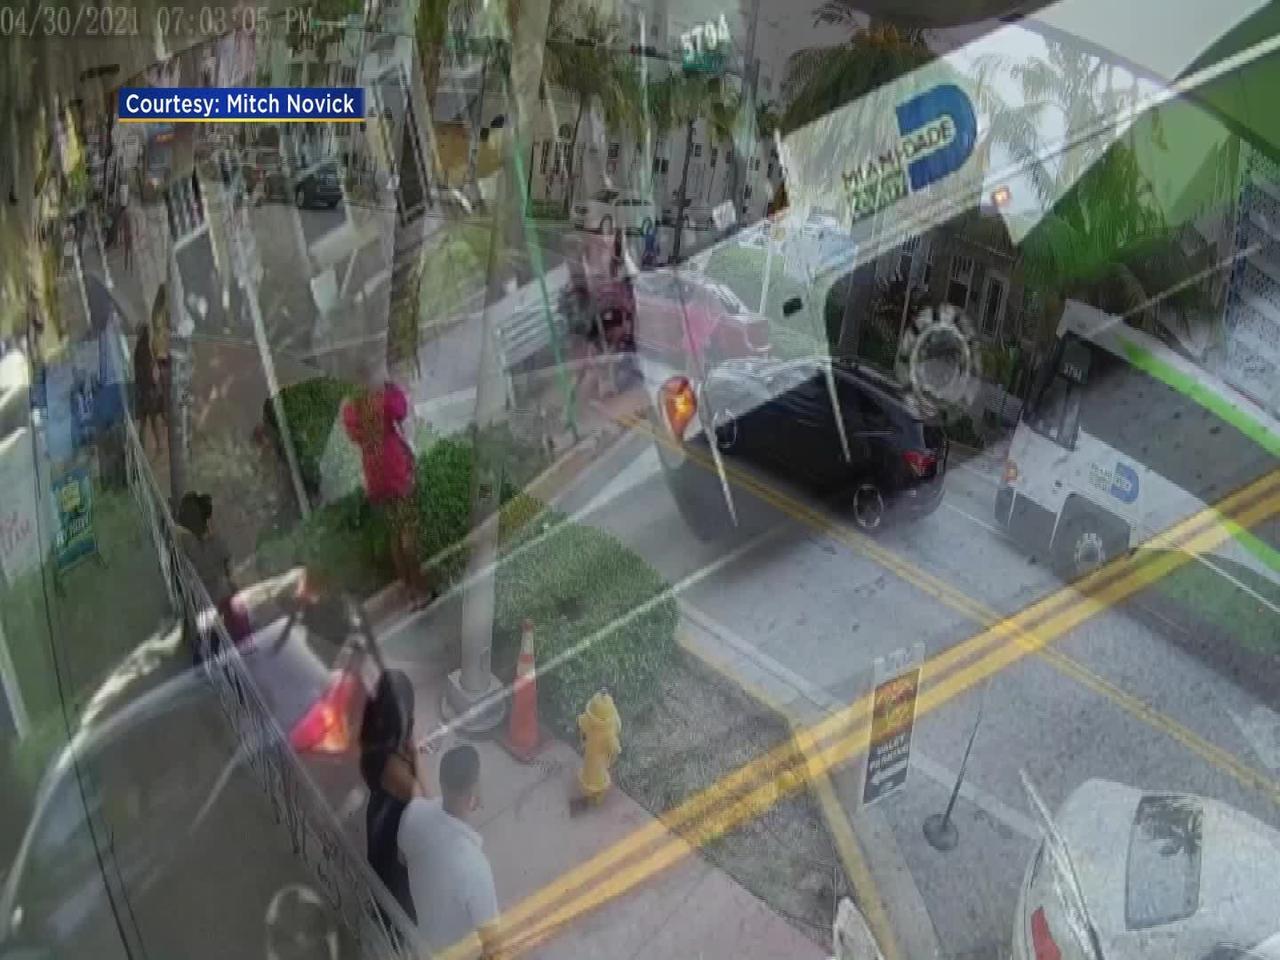 WEB EXTRA: South Beach Tourists Beaten